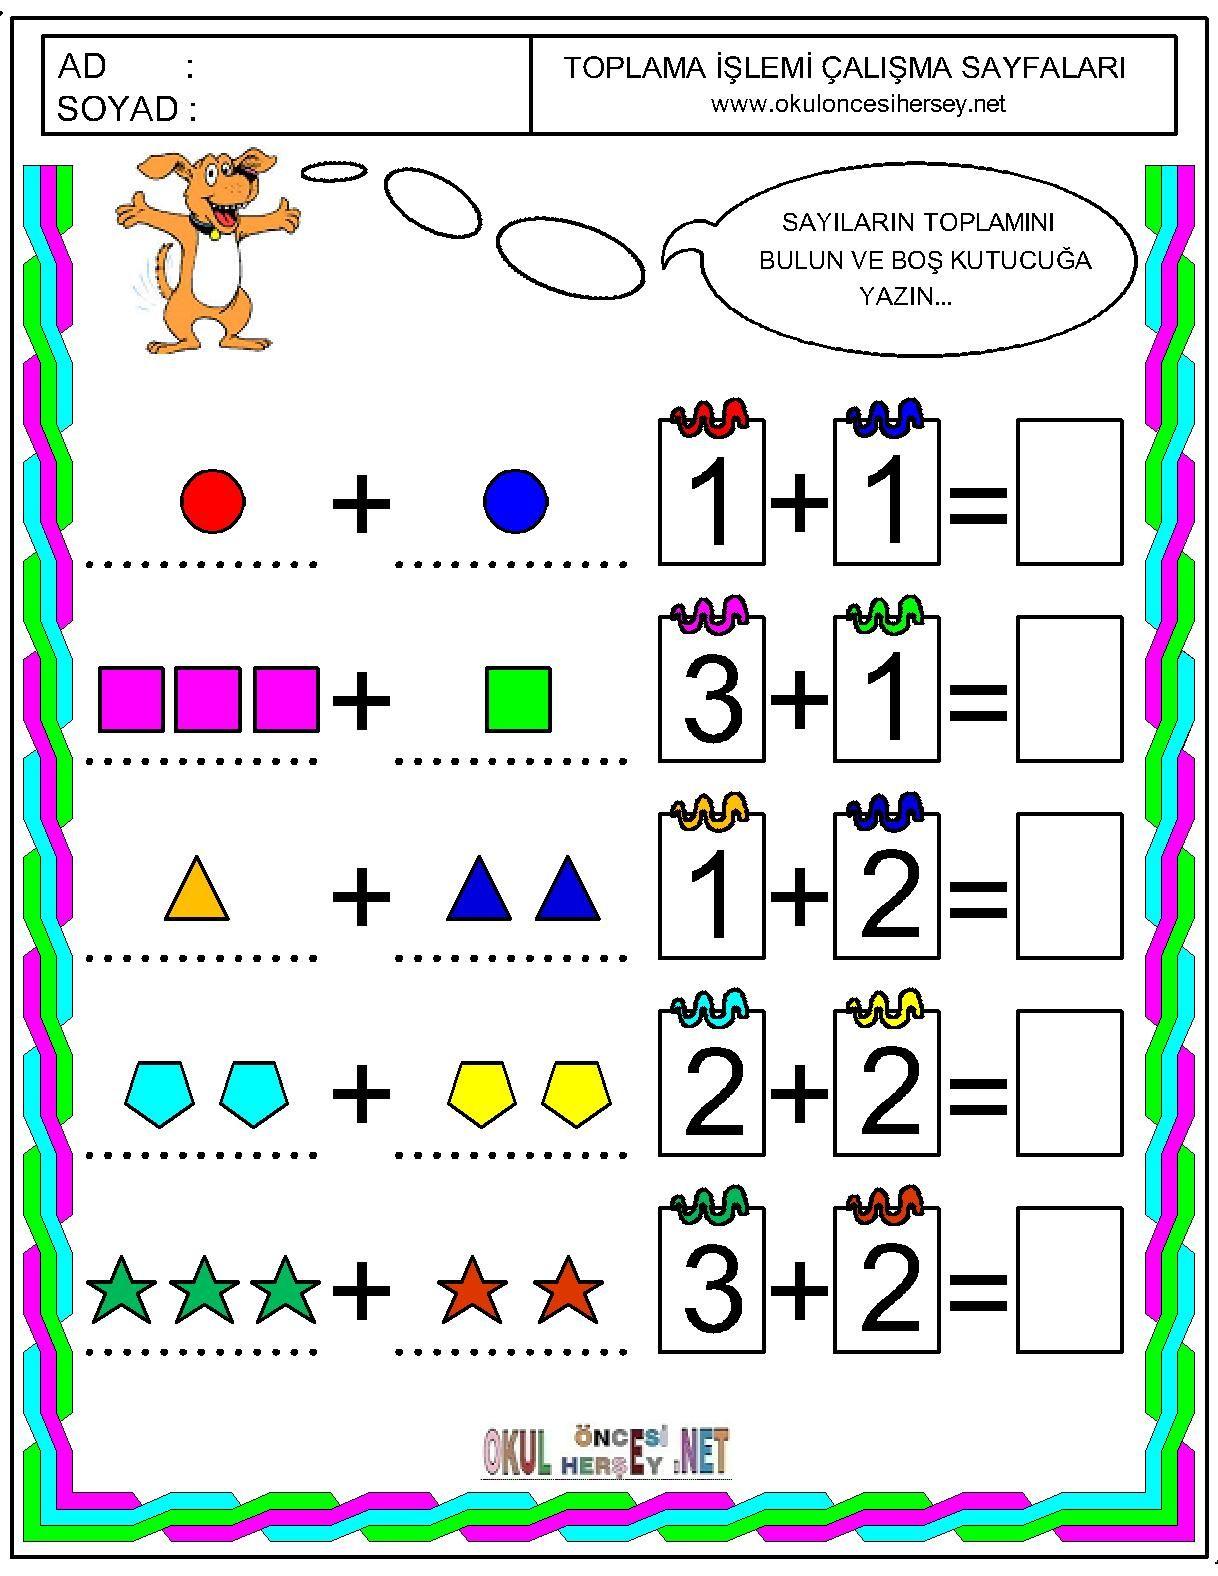 Okul Oncesi Cizgi Calismalari Okul Okul Oncesi Matematik